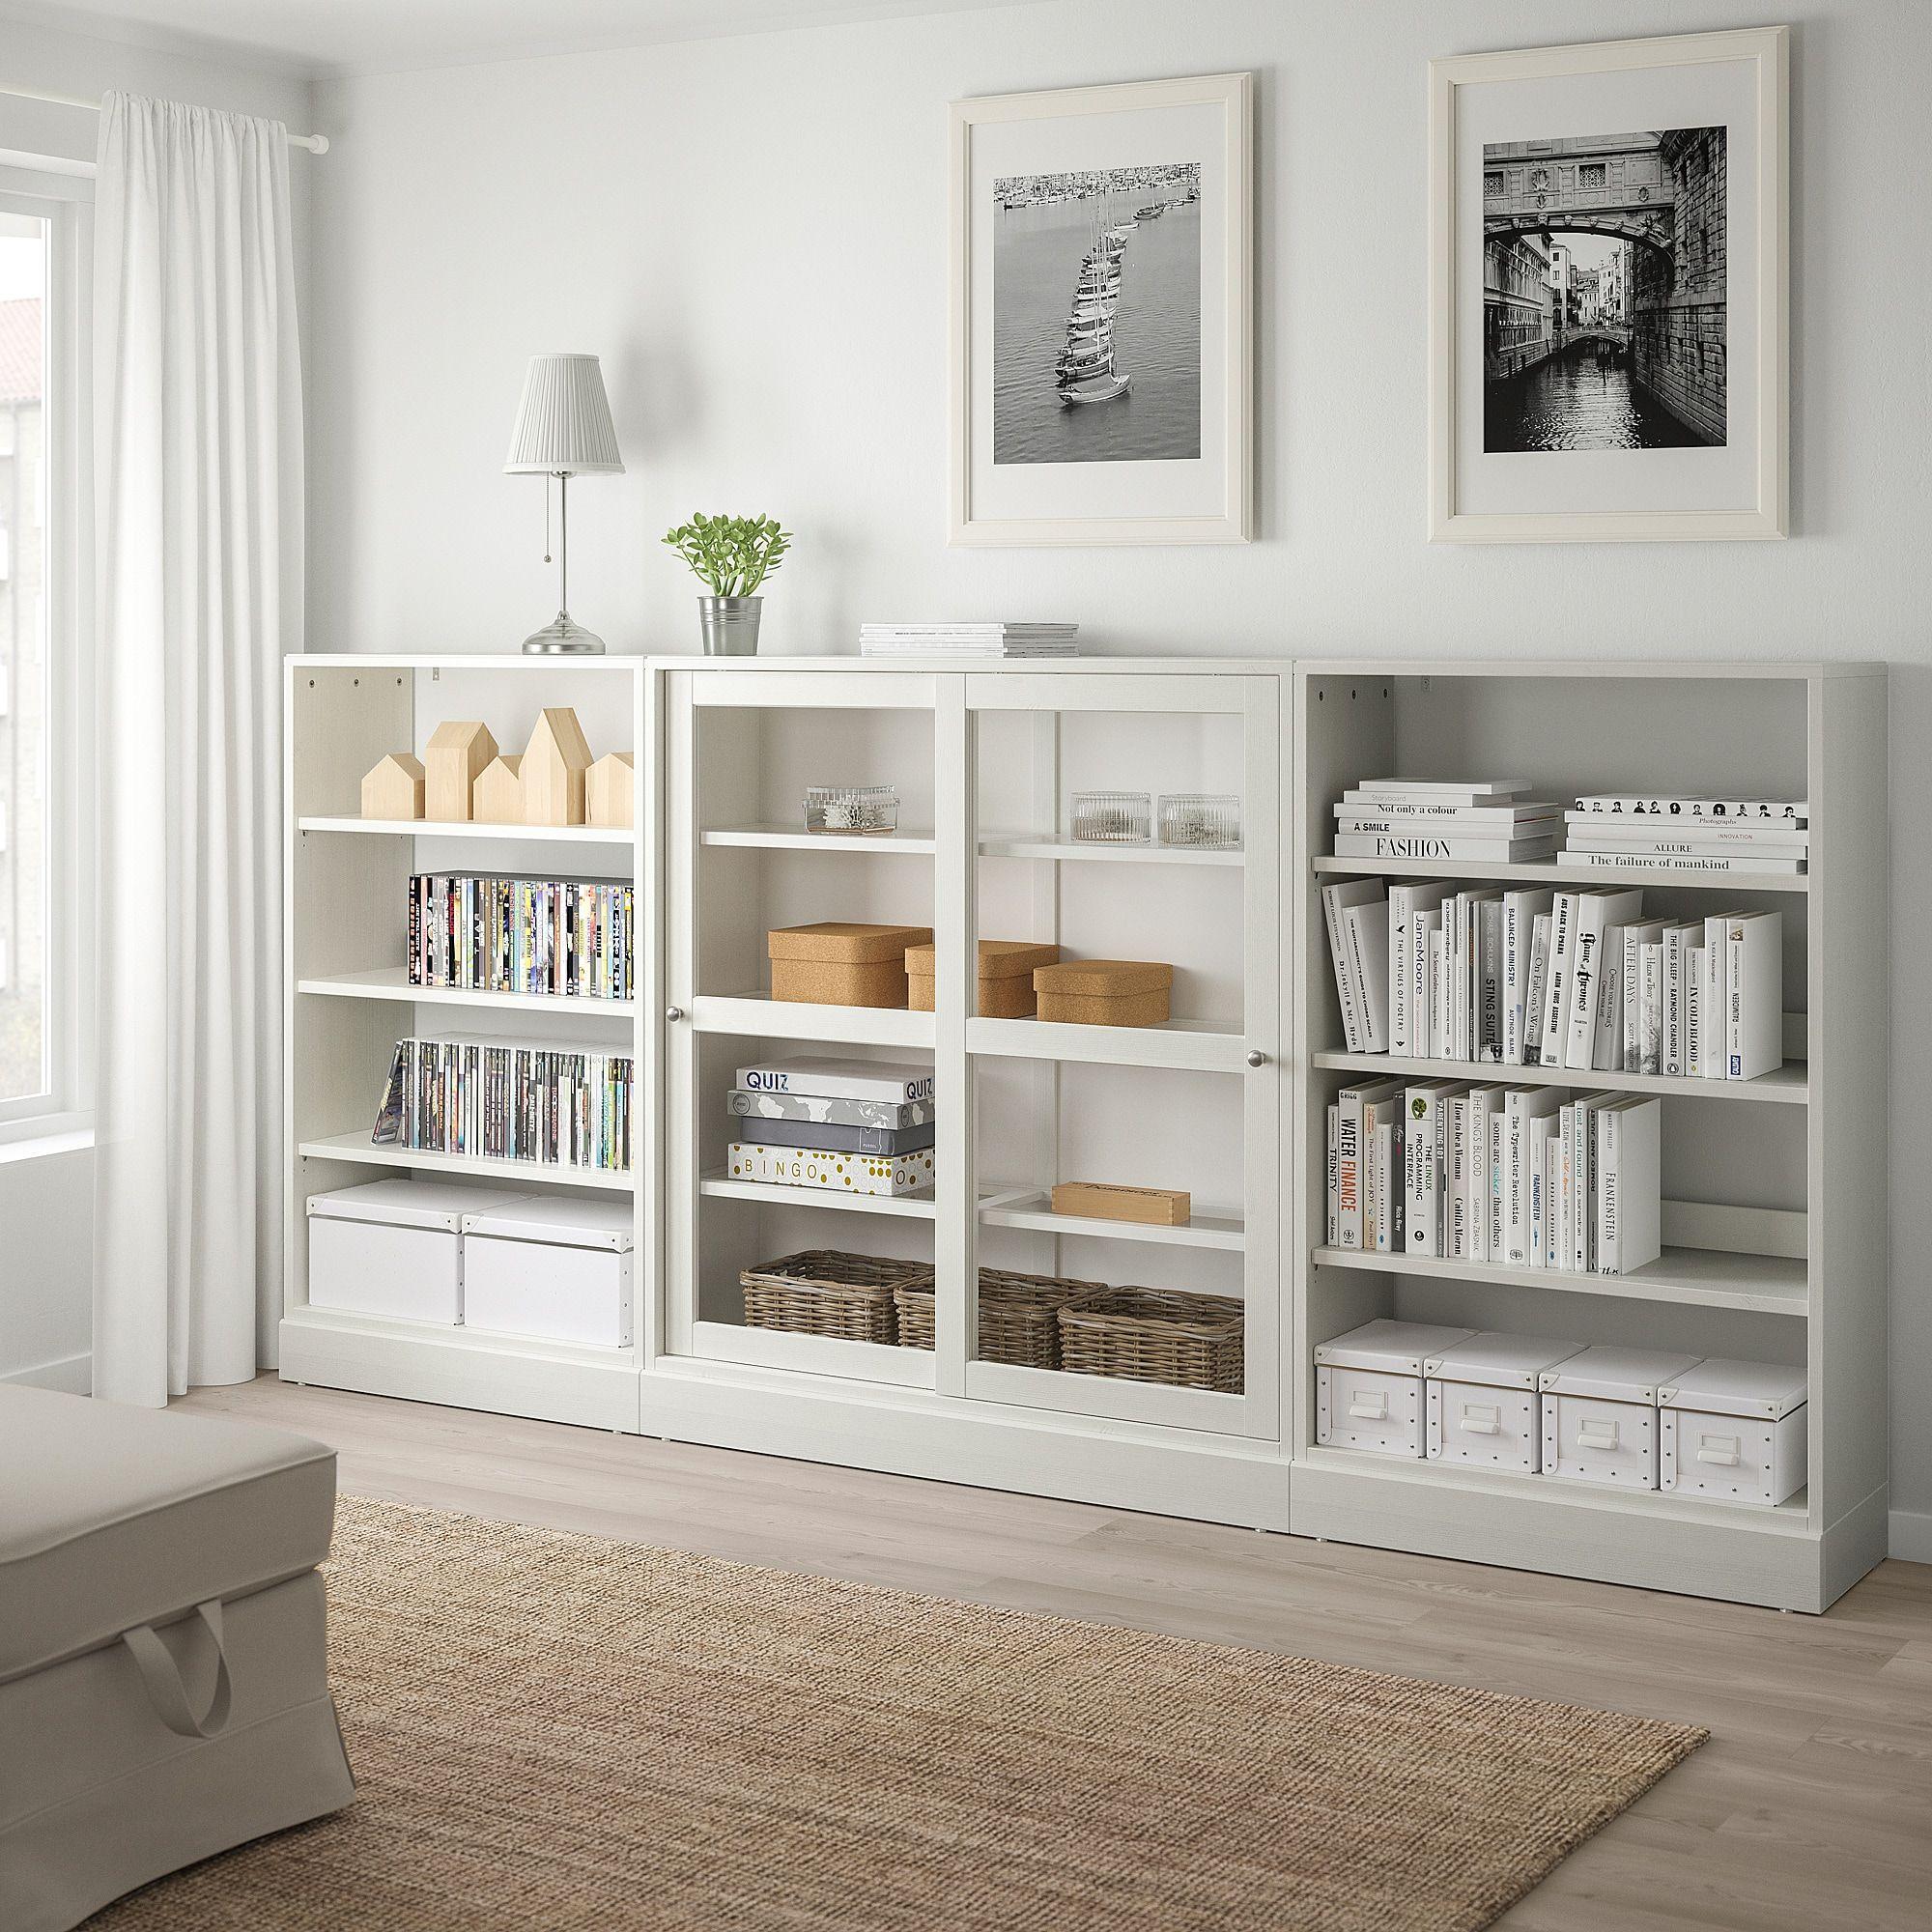 Ikea Havsta White Storage With Sliding Glass Doors Ikea Bookcase